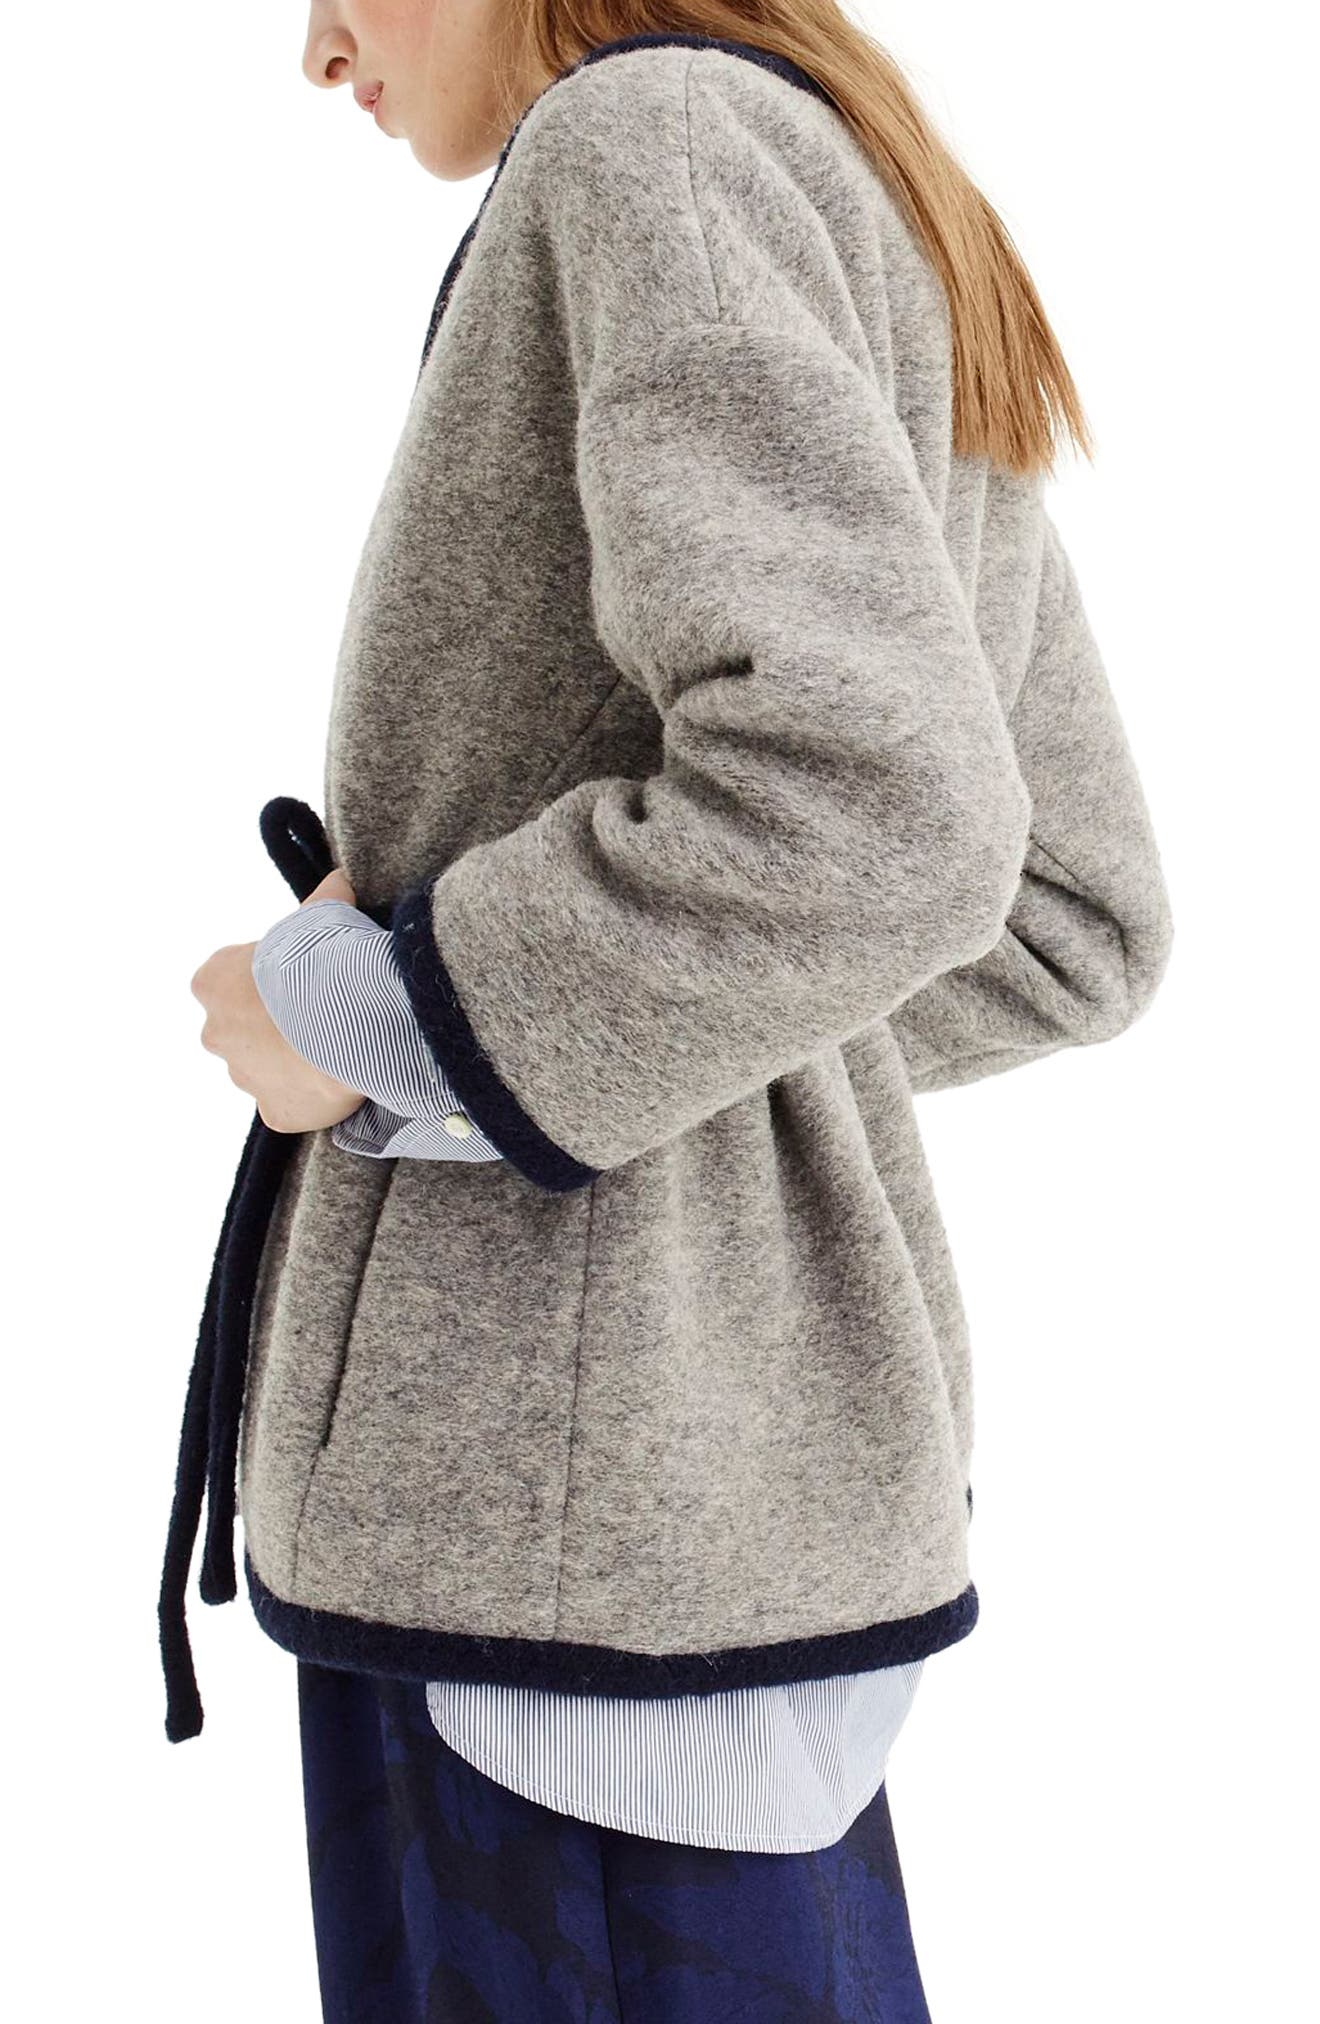 Branford Boiled Wool Blend Jacket,                             Alternate thumbnail 2, color,                             Heather Graphite